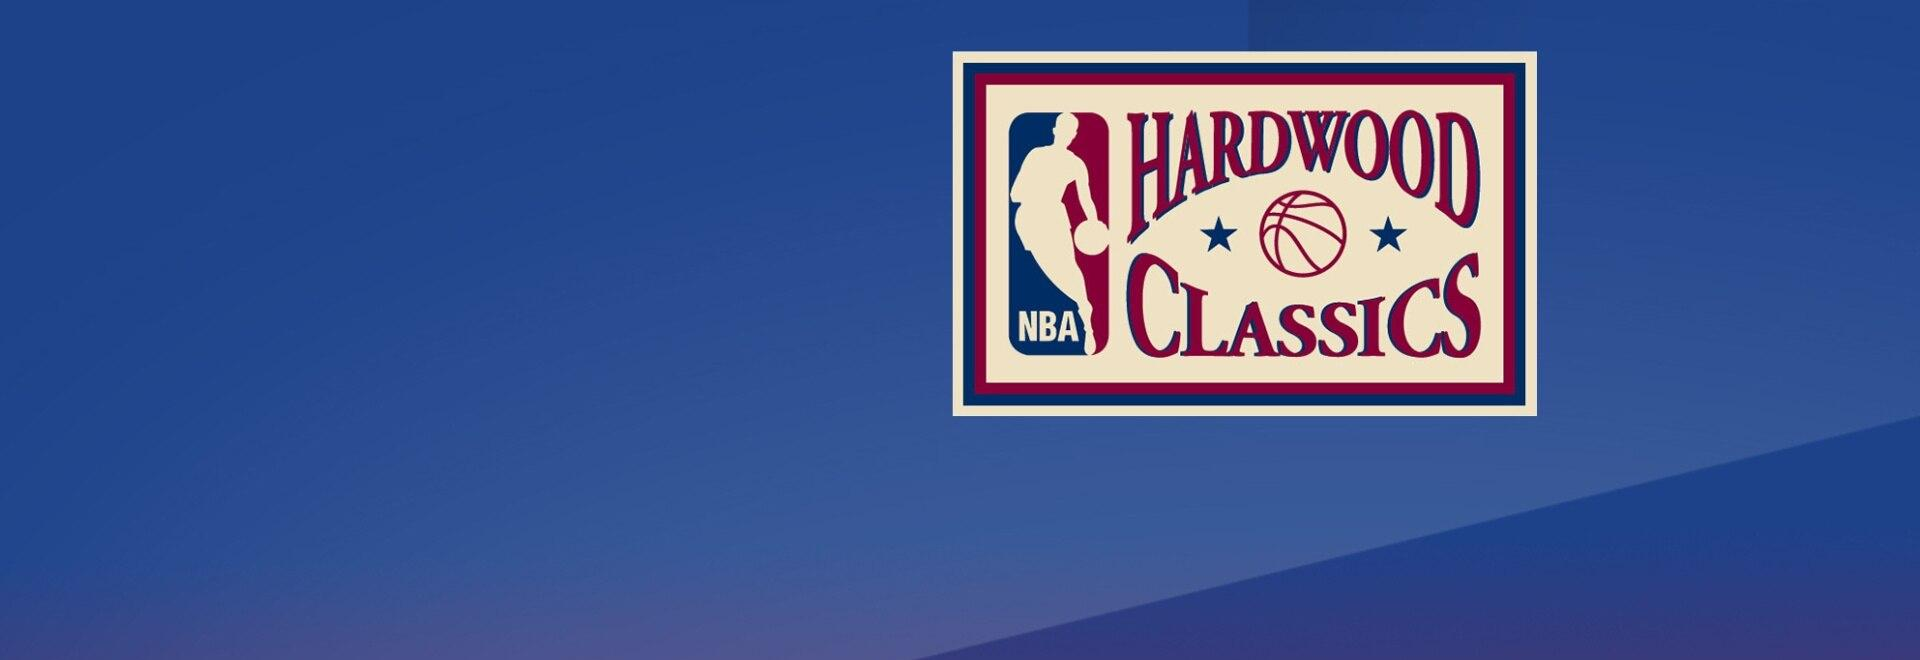 Pistons - Trail Blazers 1990. Game 5 NBA Finals